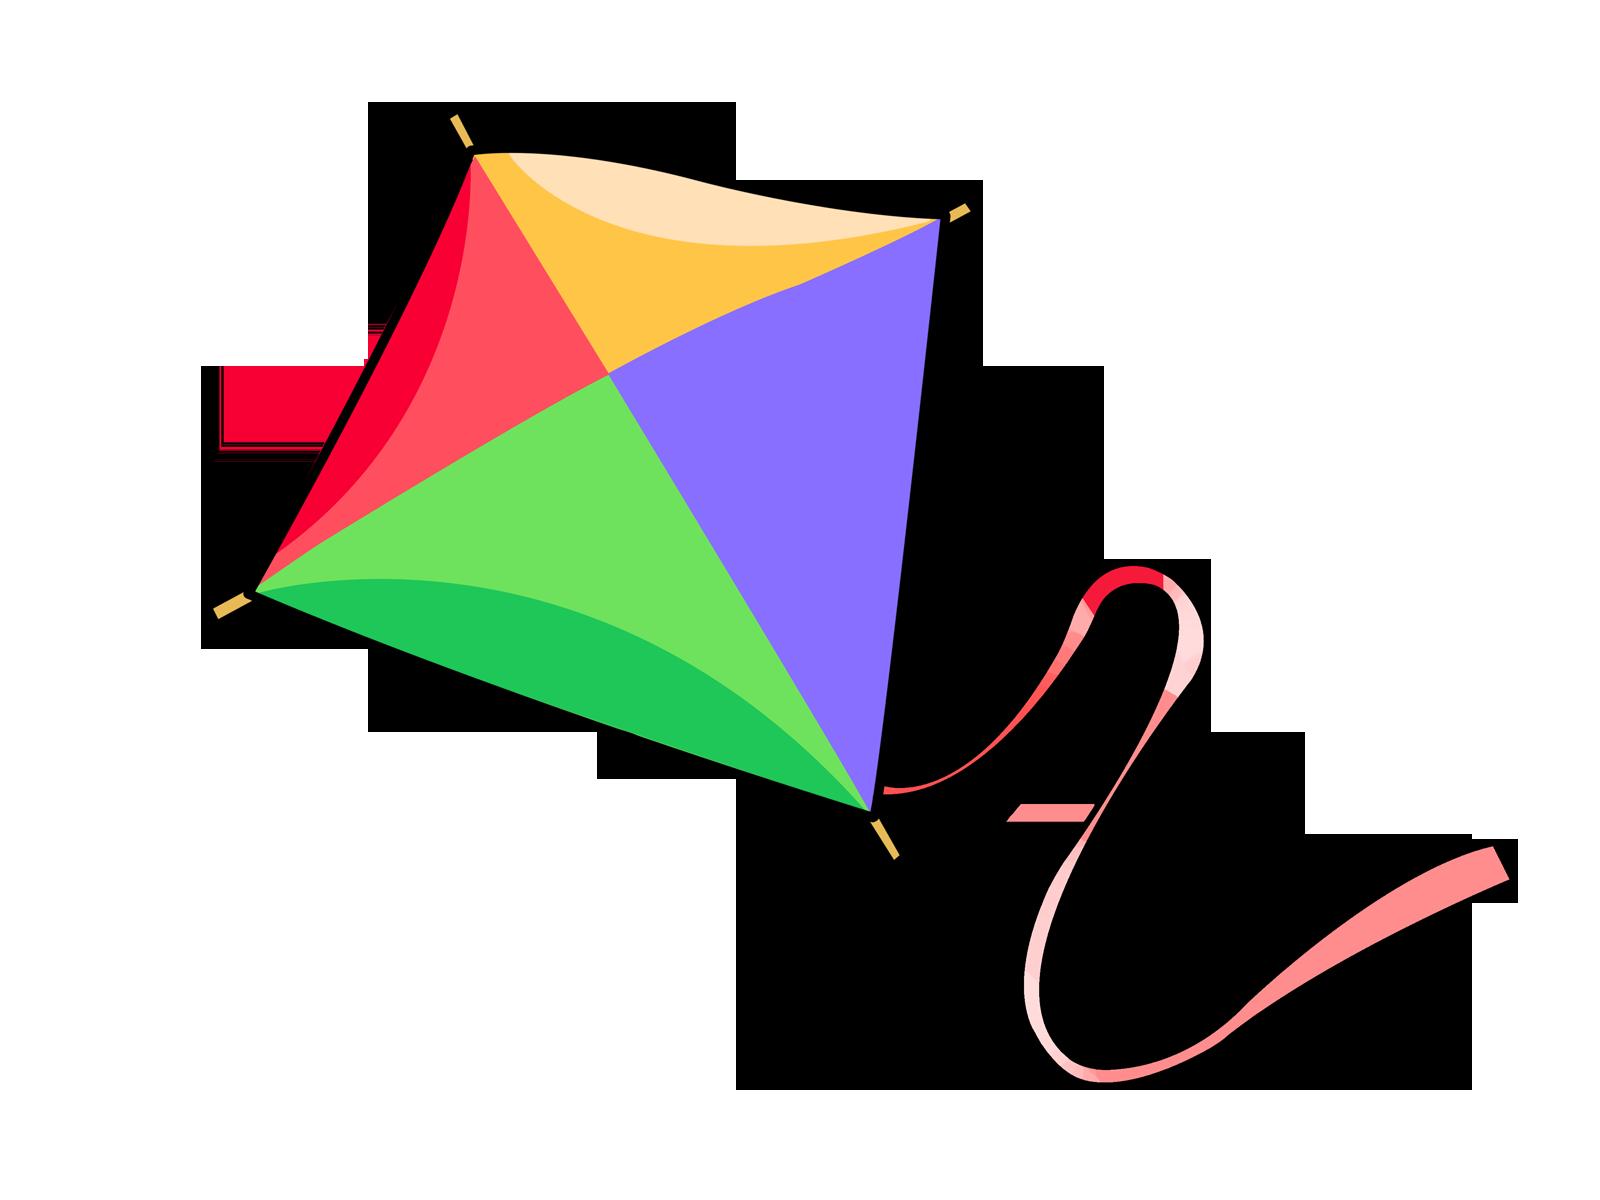 HQ Kite Wallpapers | File 130.36Kb